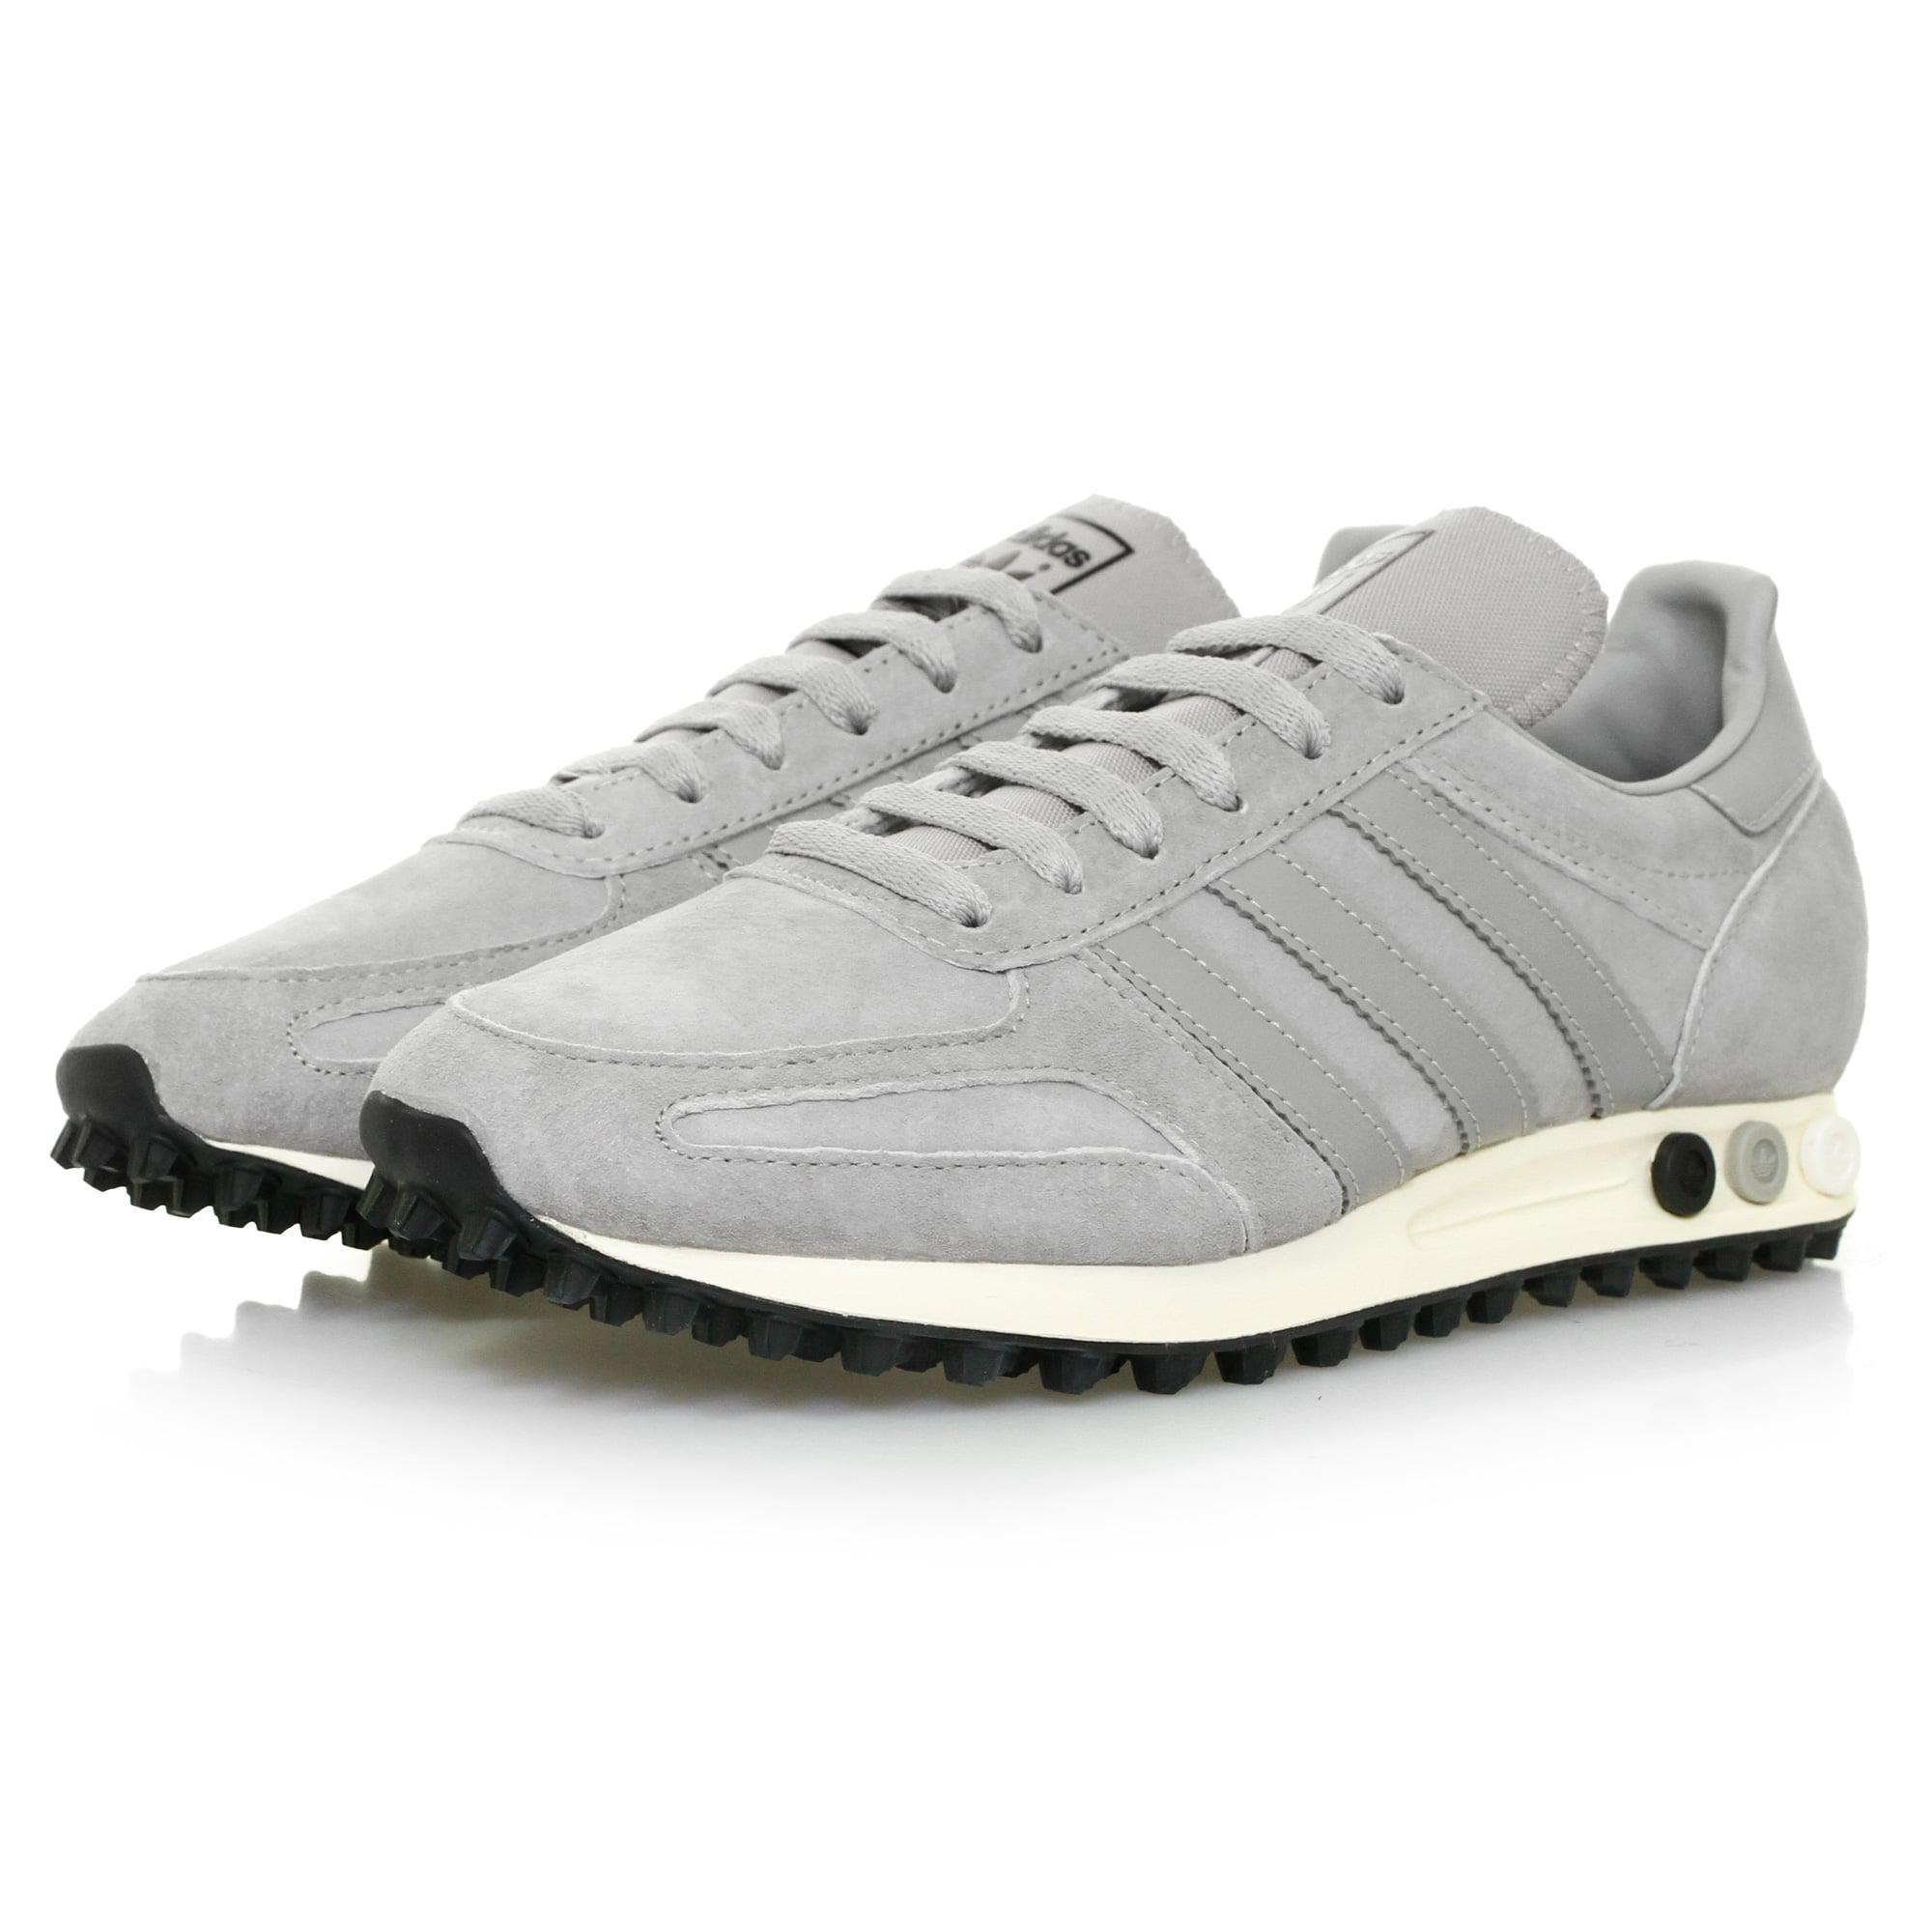 brand new 17b3c 7c167 adidas Originals La Trainer Og Grey Shoe in Gray for Men - Lyst